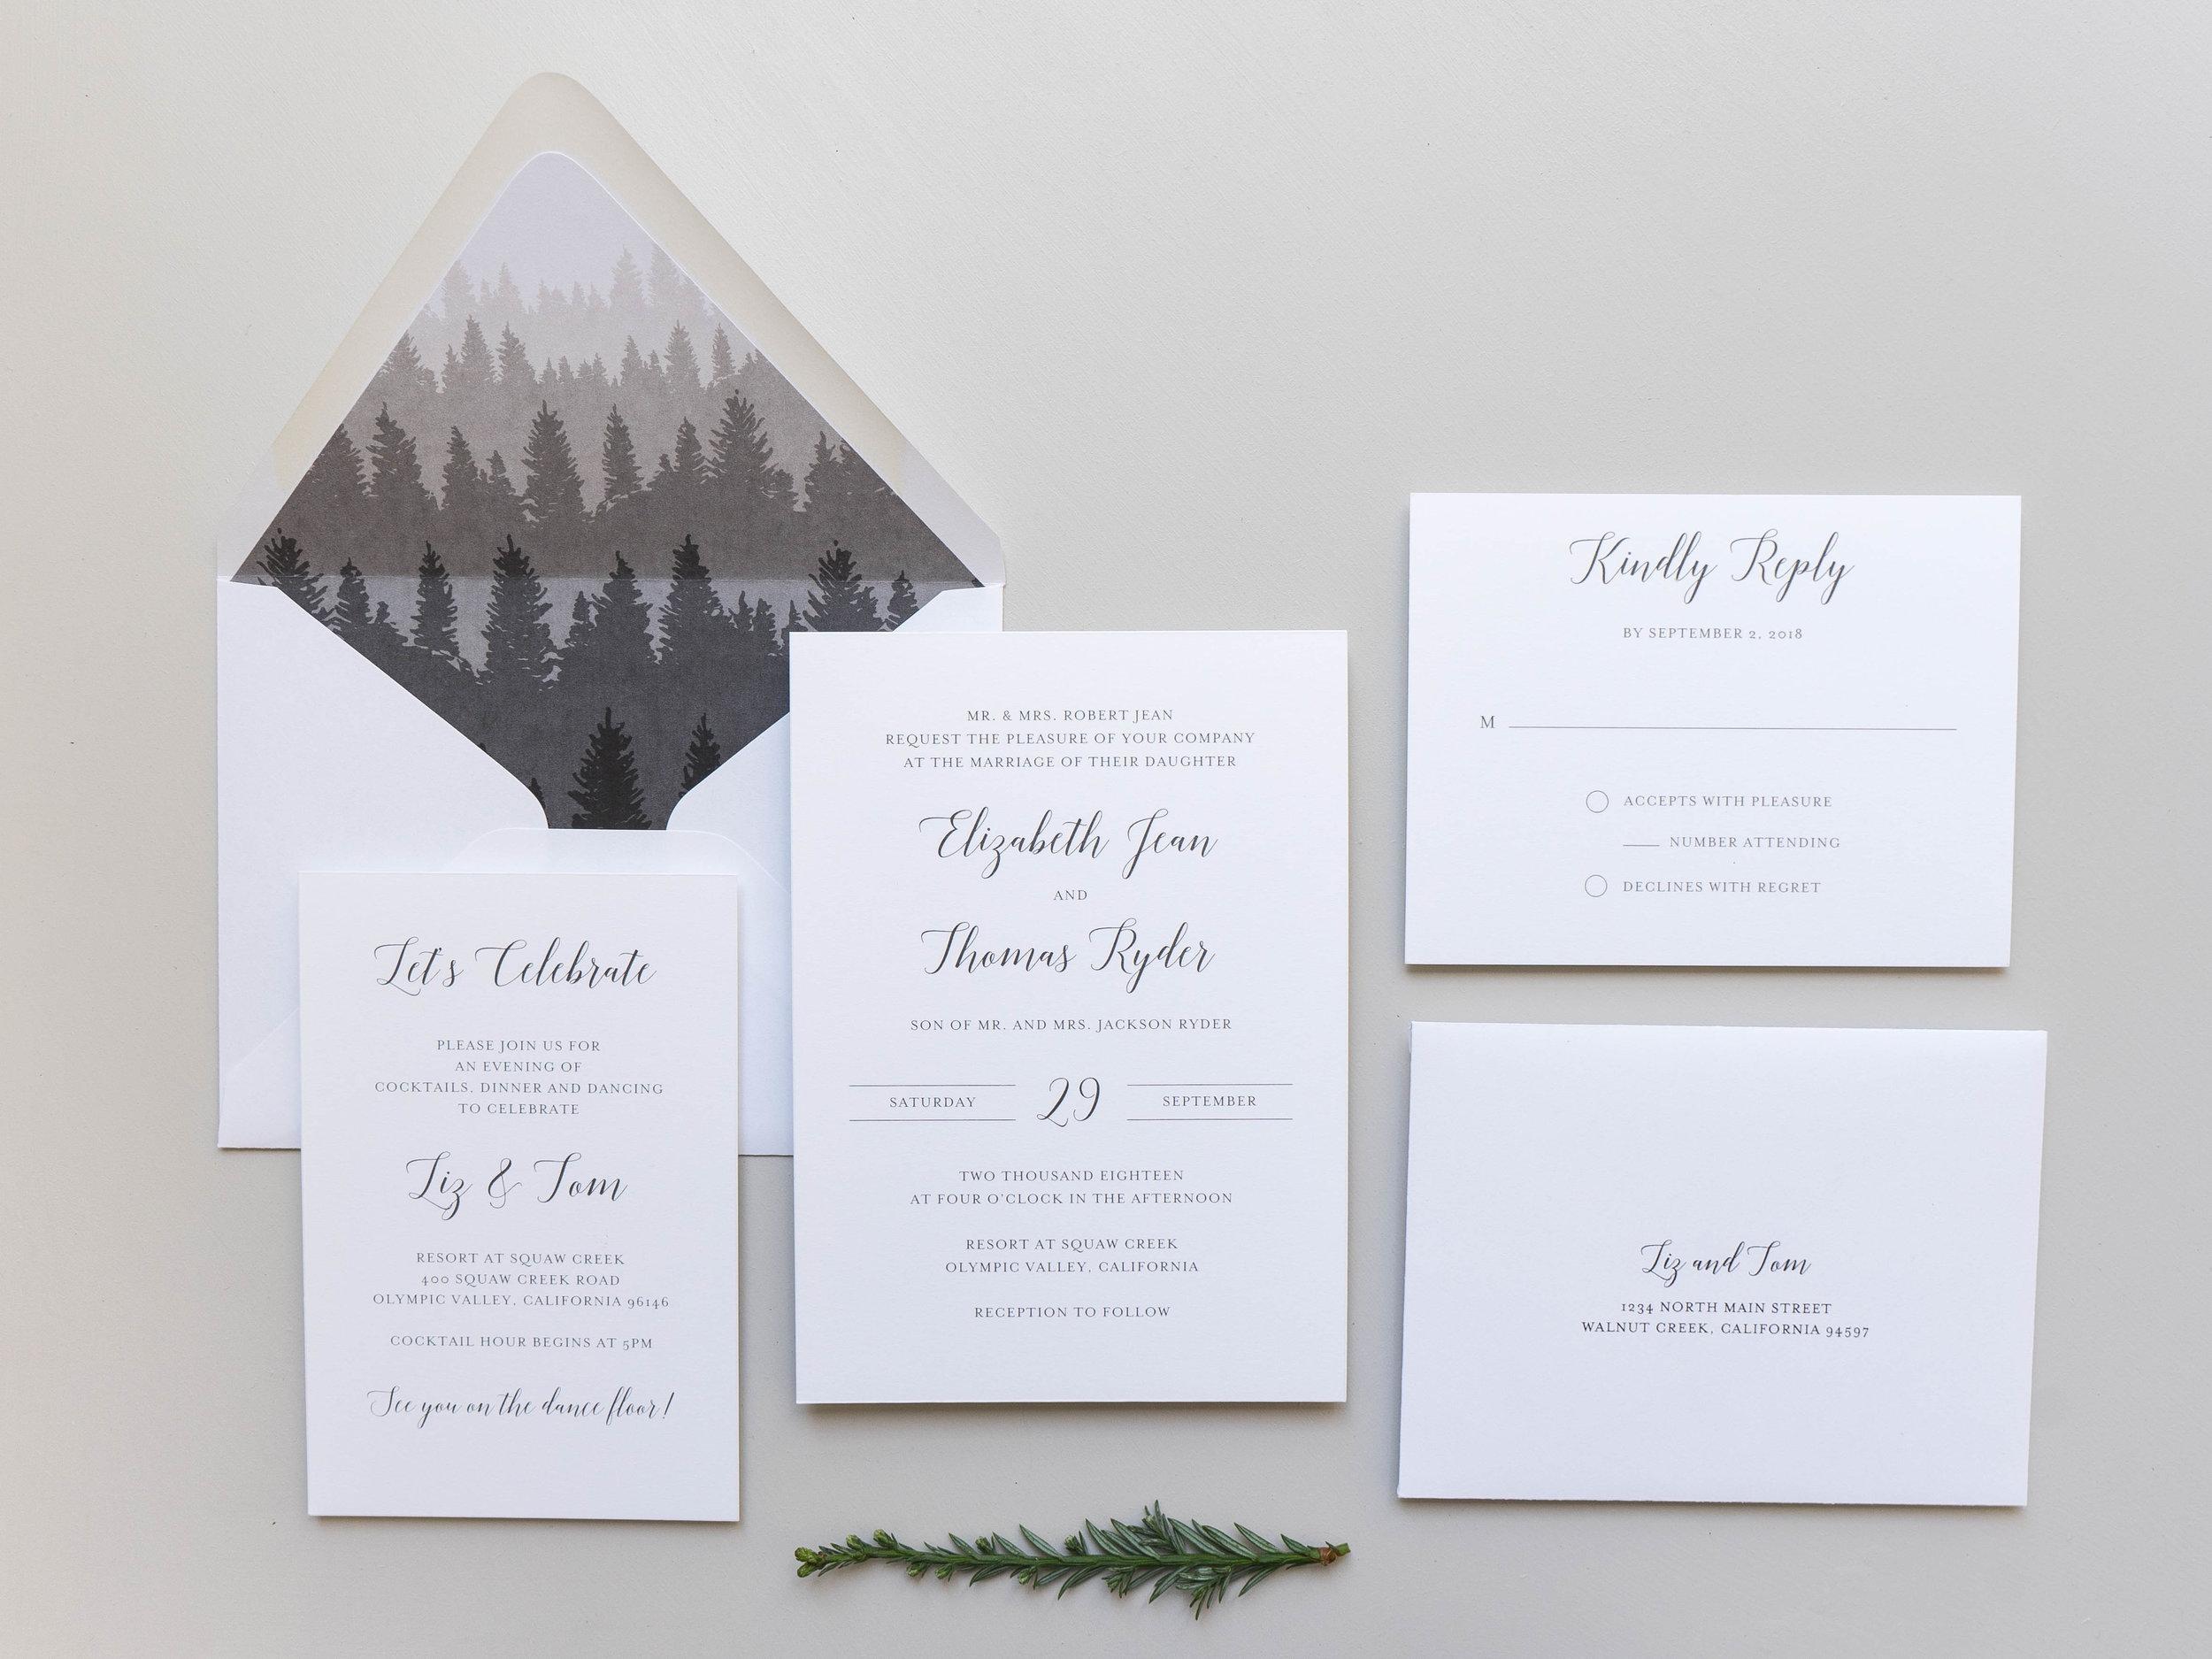 *Elegant Mountain Wedding Invitations by Just Jurf-4.jpg